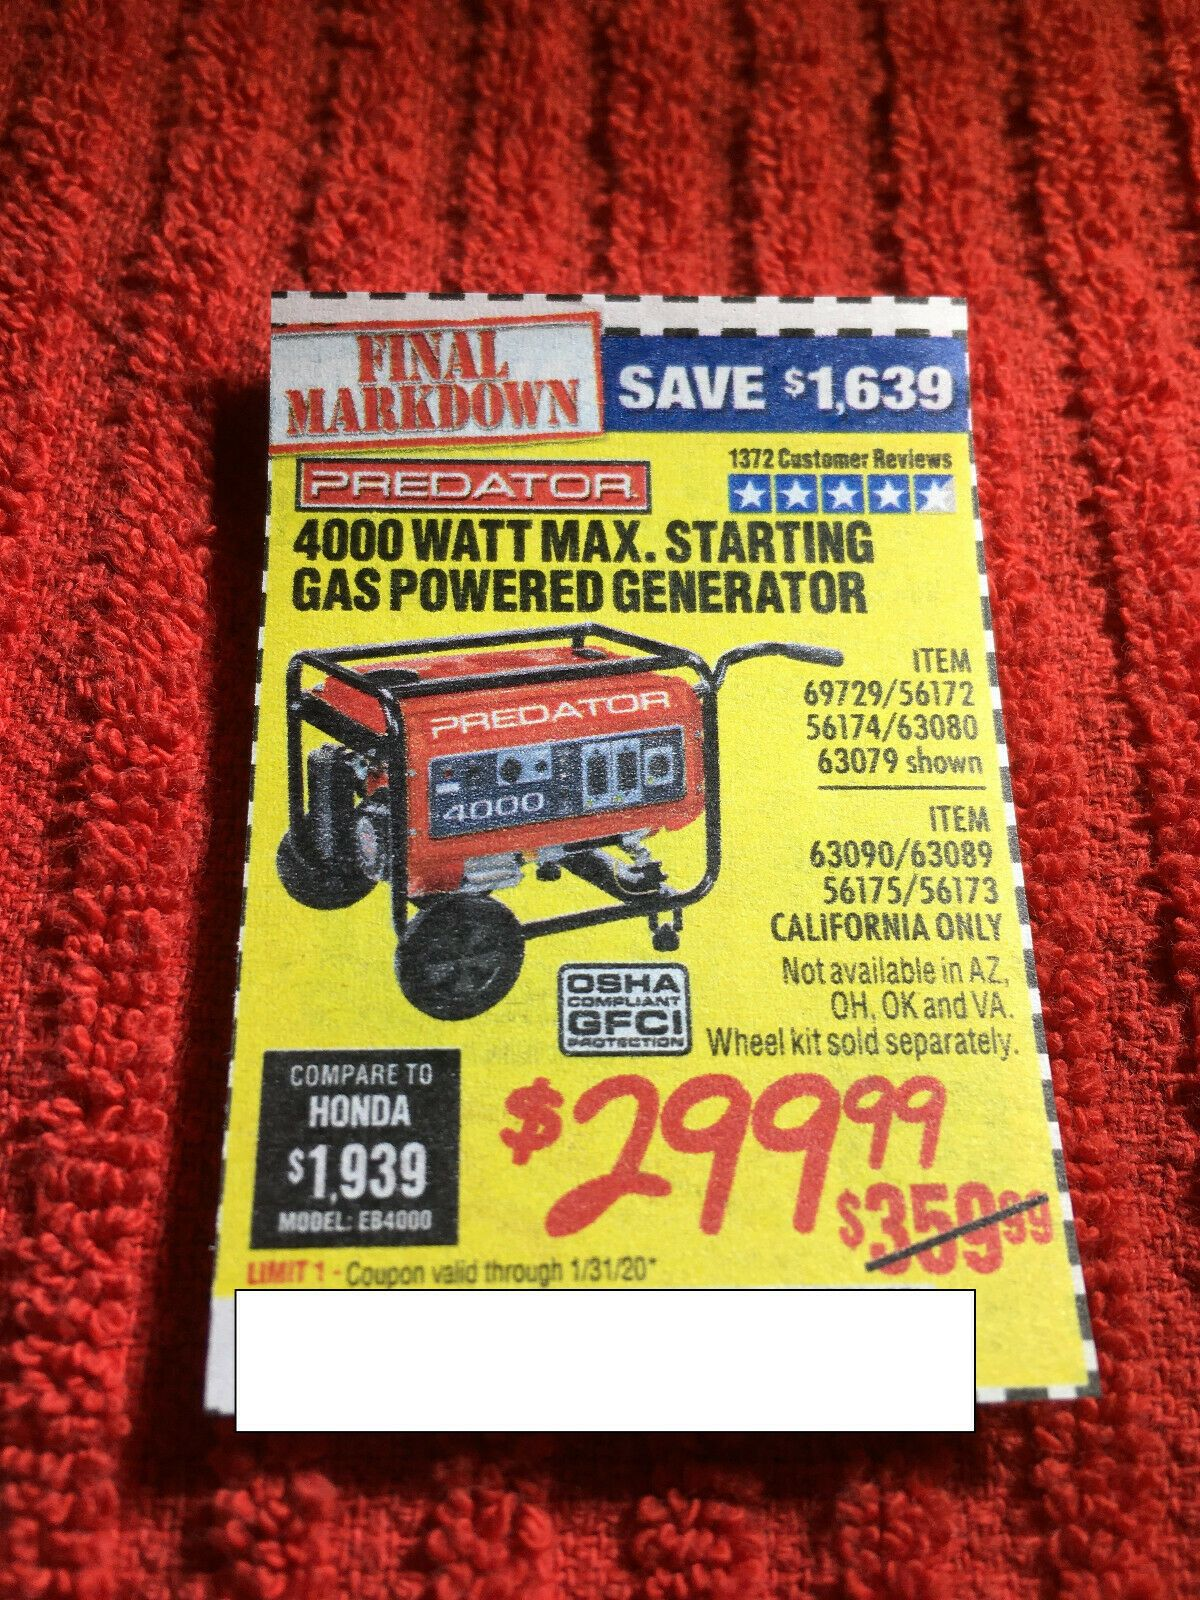 Coupon to save on 4000 Watt Max Starting Gas Generator